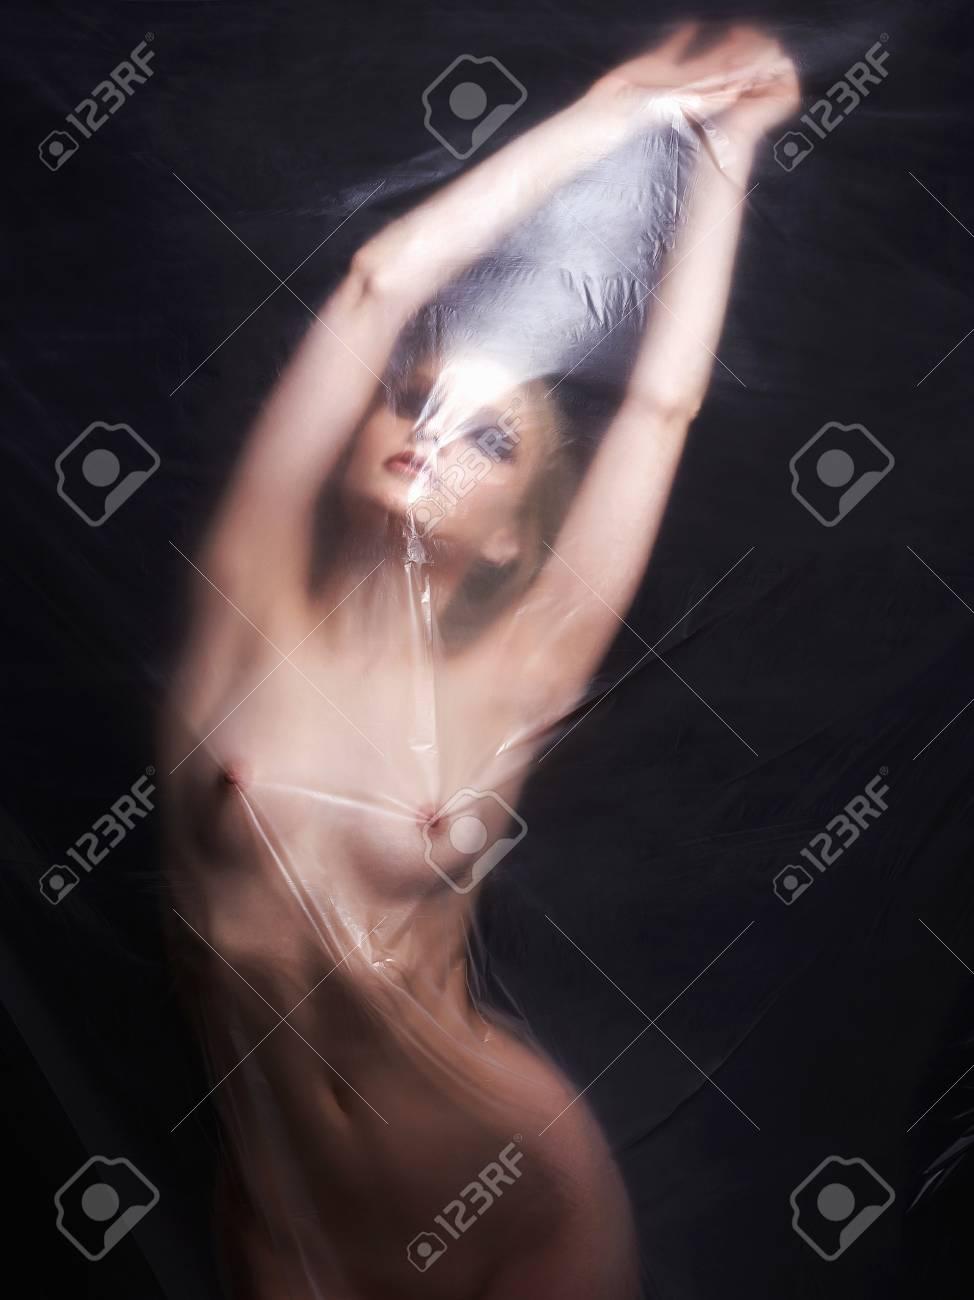 Flavor flav naked pics